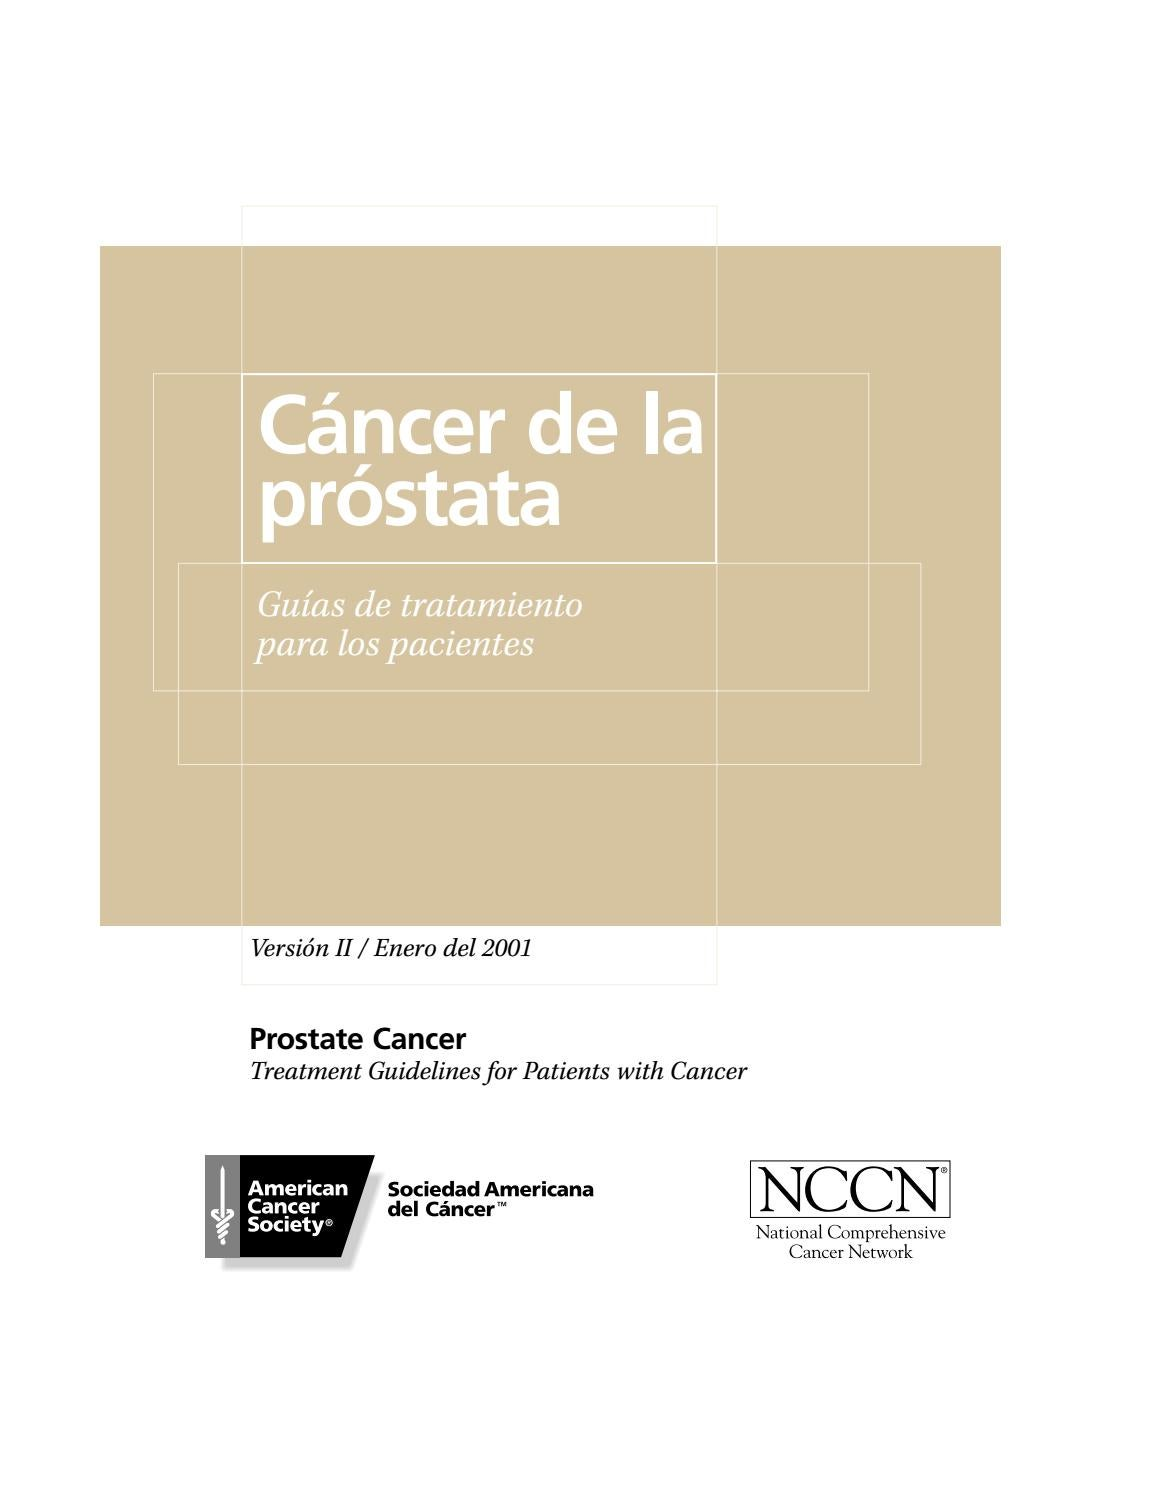 cancer de prostata sociedad americana